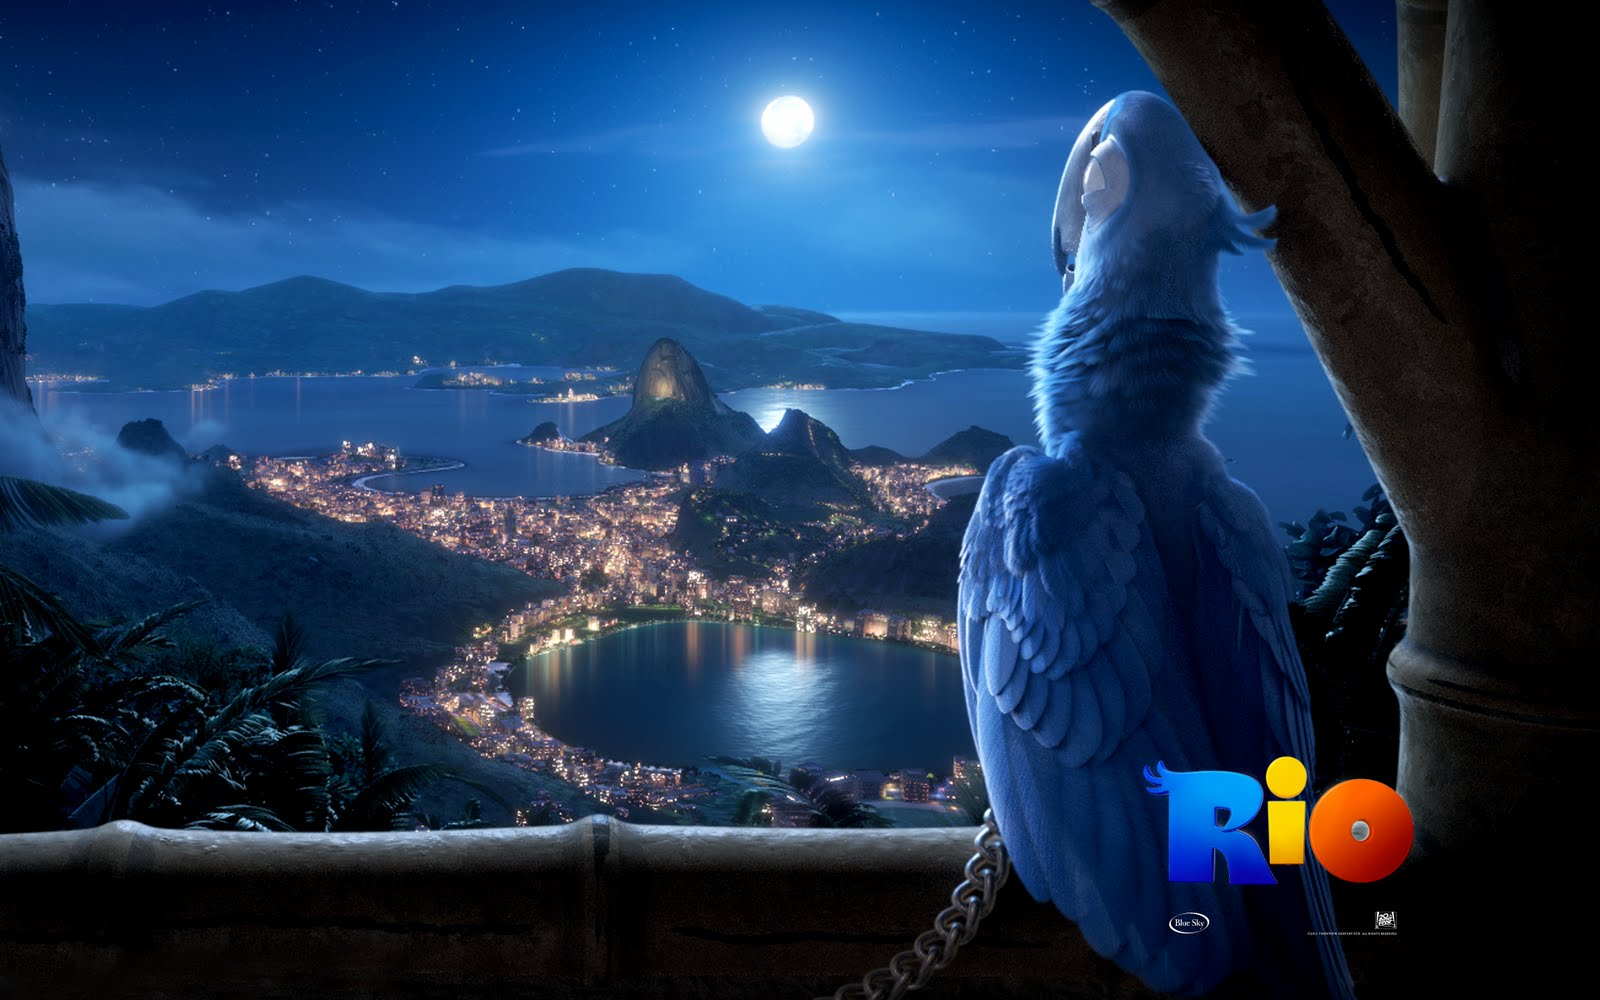 http://4.bp.blogspot.com/-8G4Xke5Kxx8/Te3rduuUVCI/AAAAAAAACLE/k6TPwkHWeFs/s1600/Rio+Movie+Wallpapers+%25289%2529.jpg